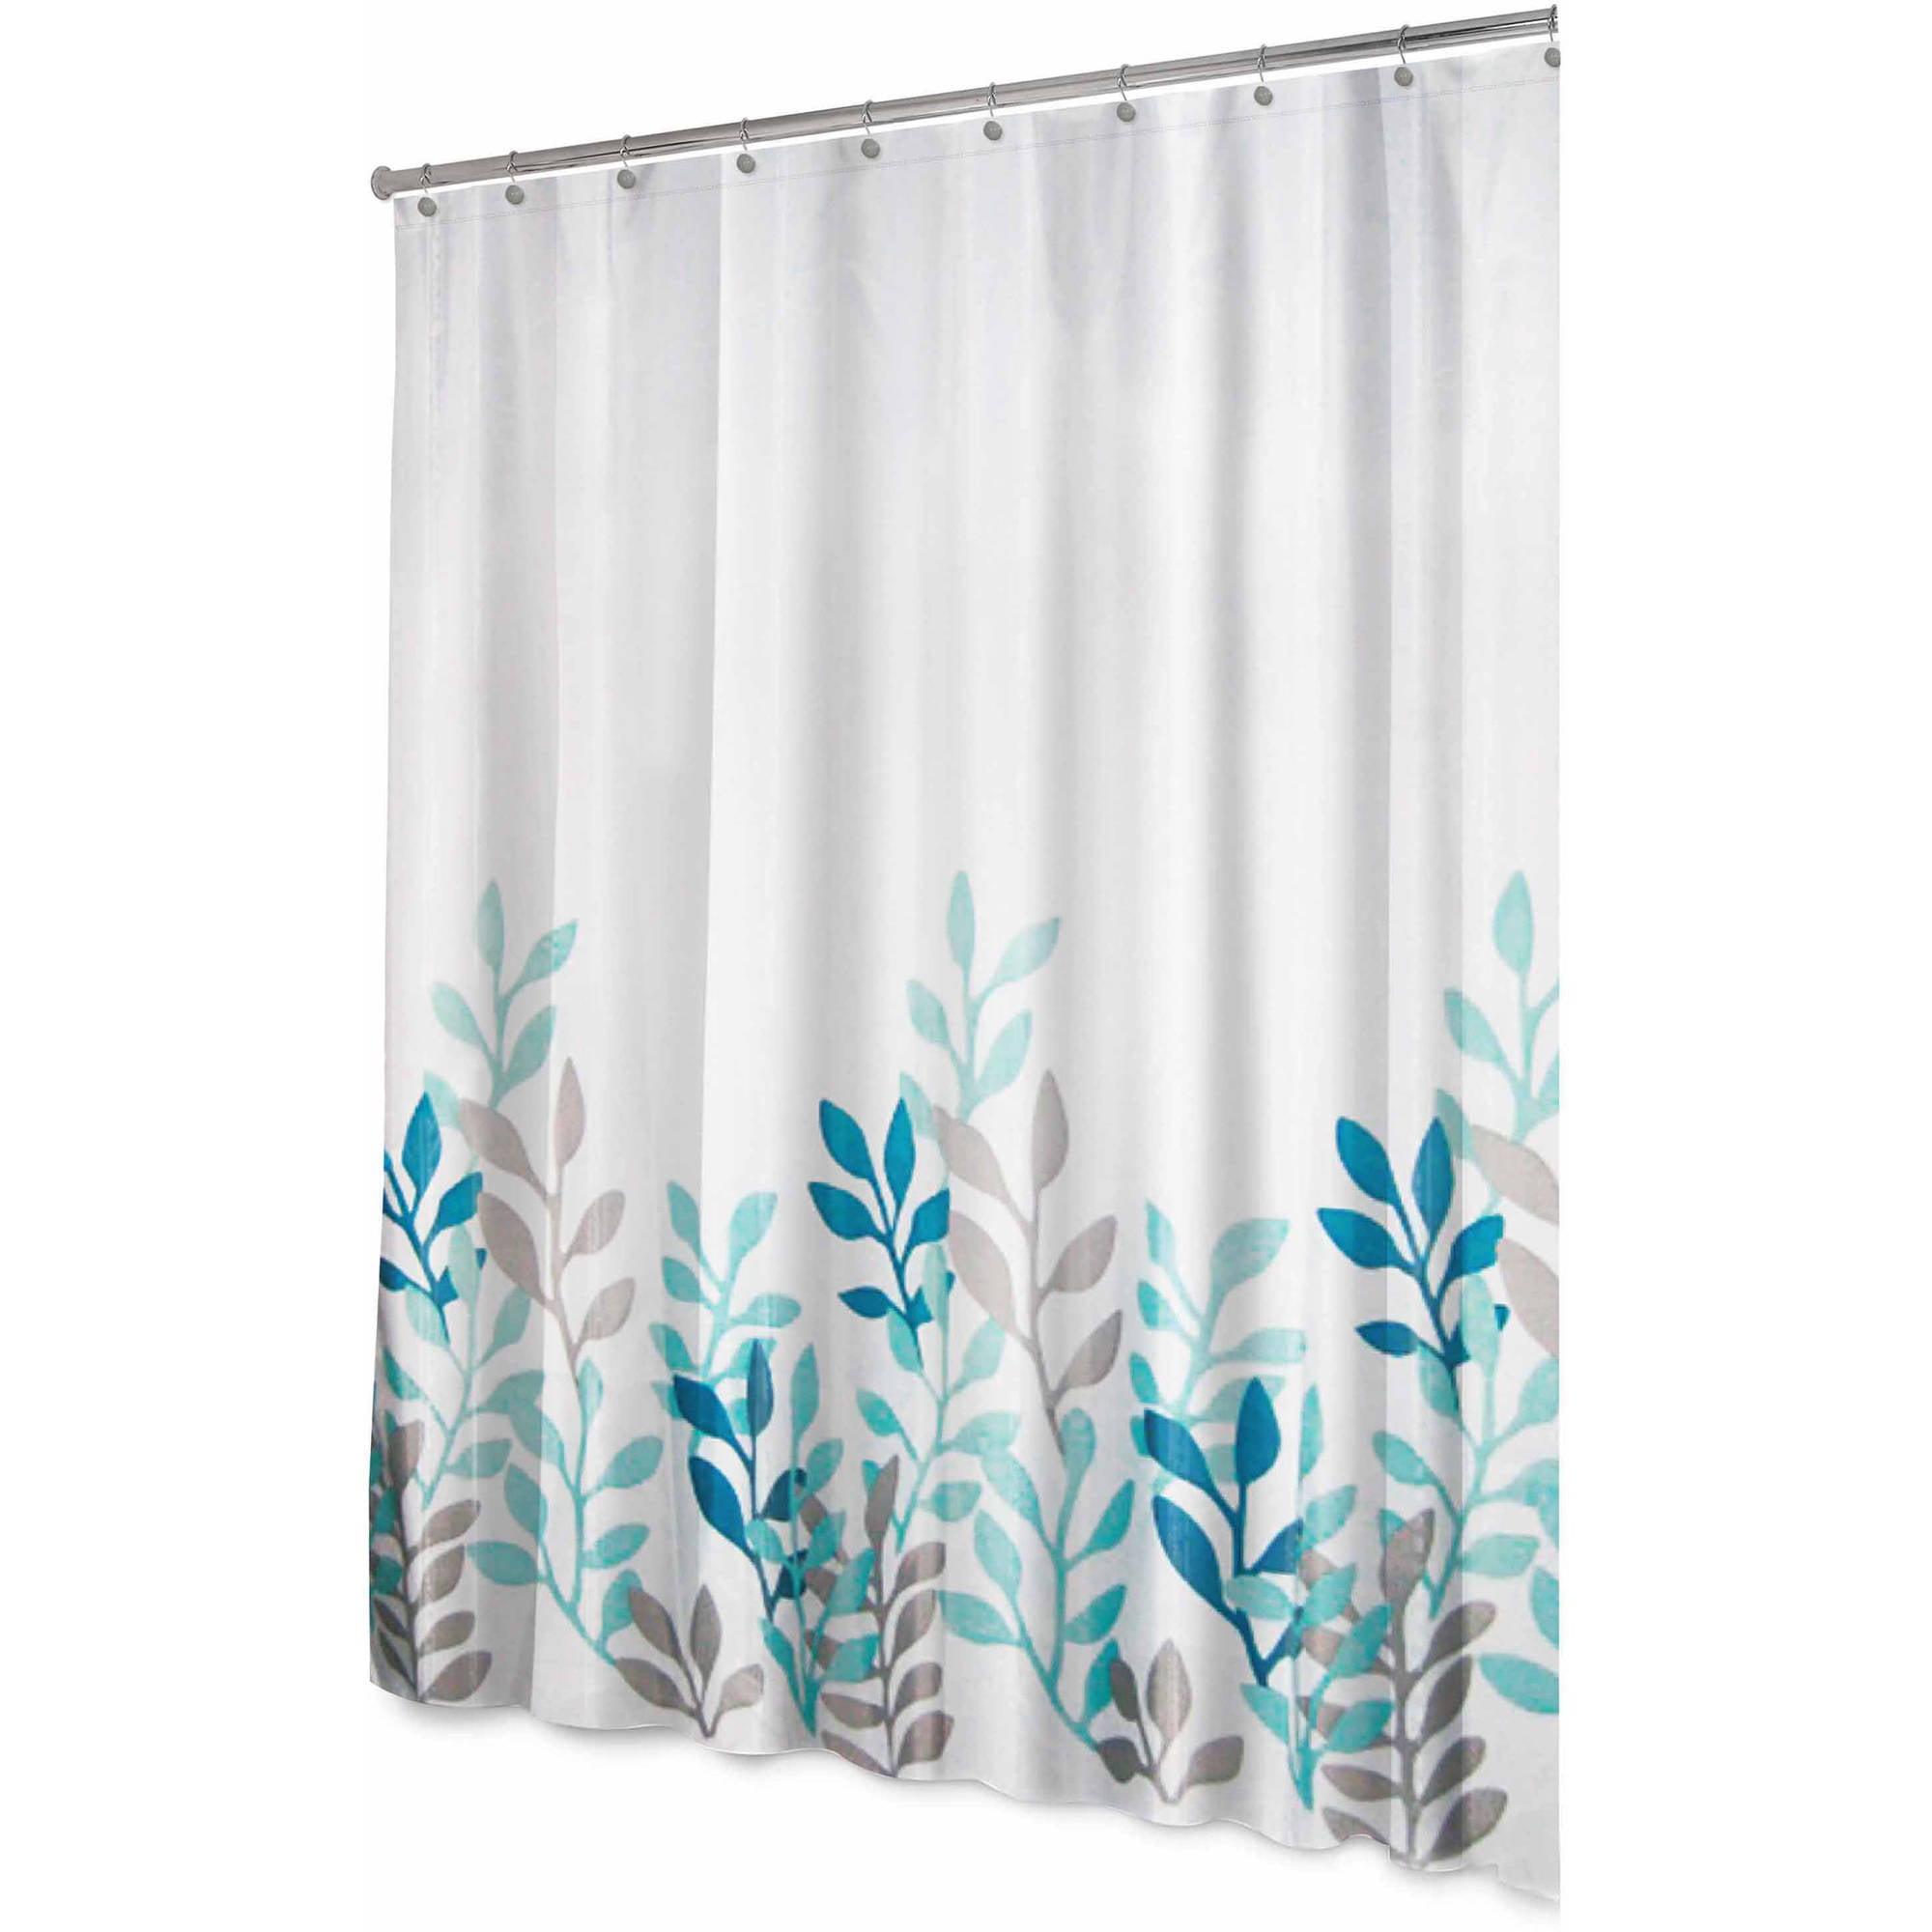 Splash Home Polyester Fabric Shower Curtain Walmart